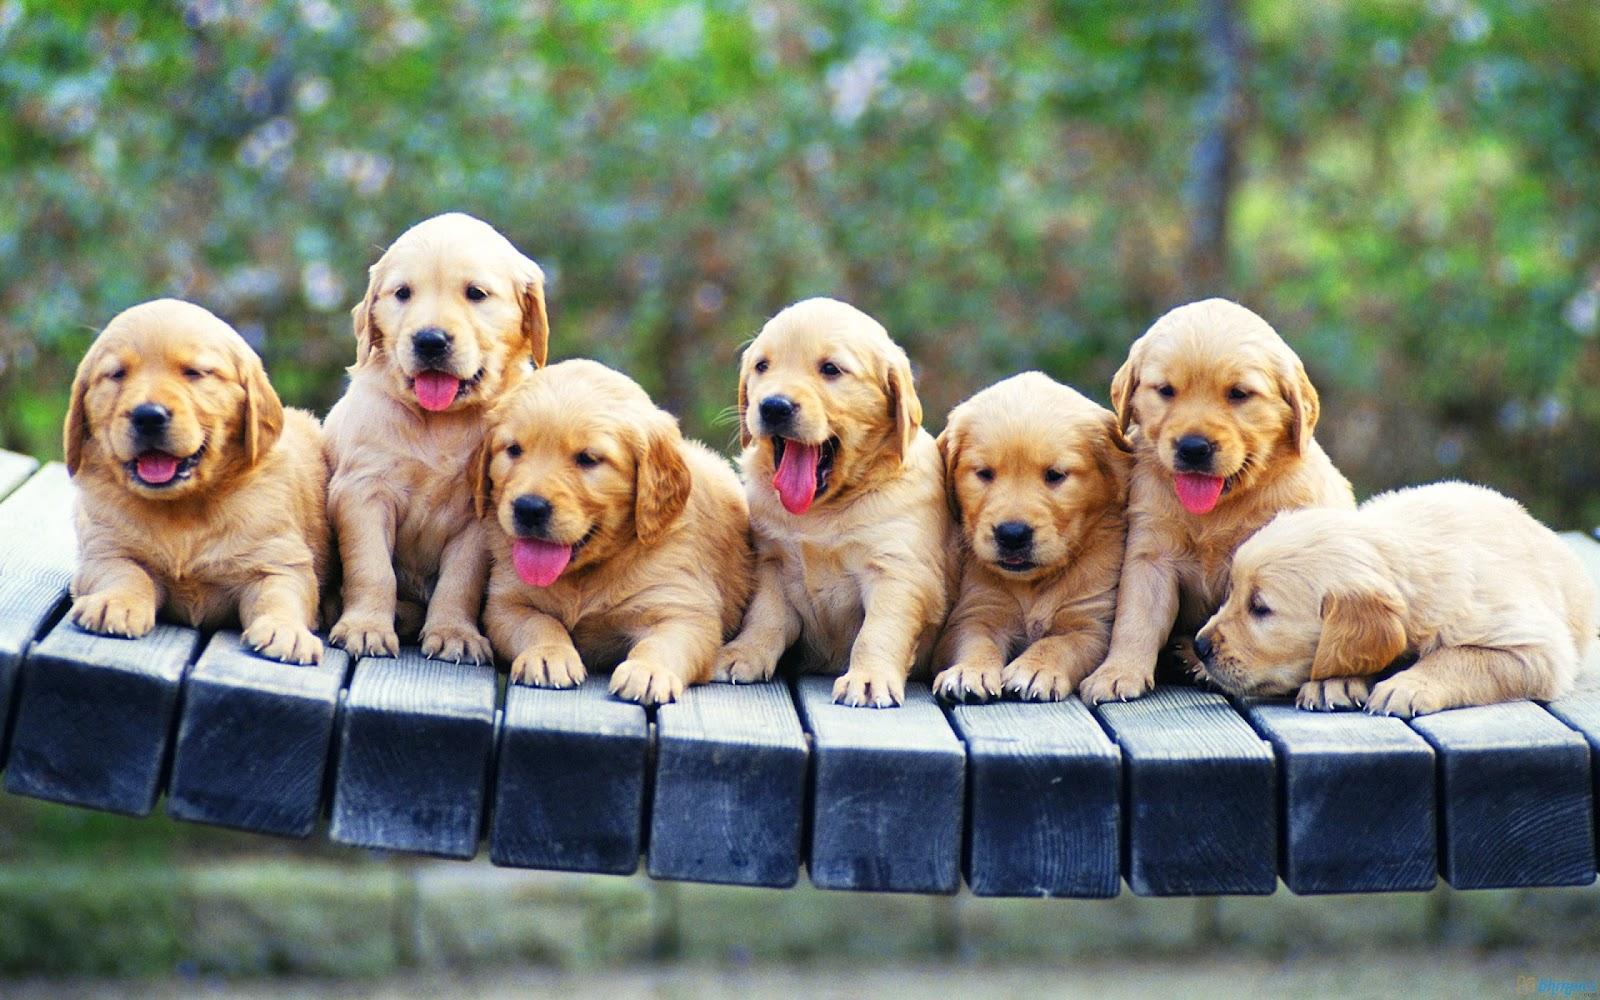 Puppies Wallpaper Seven Golden Retriever Puppies Wallpaper 1600x1000